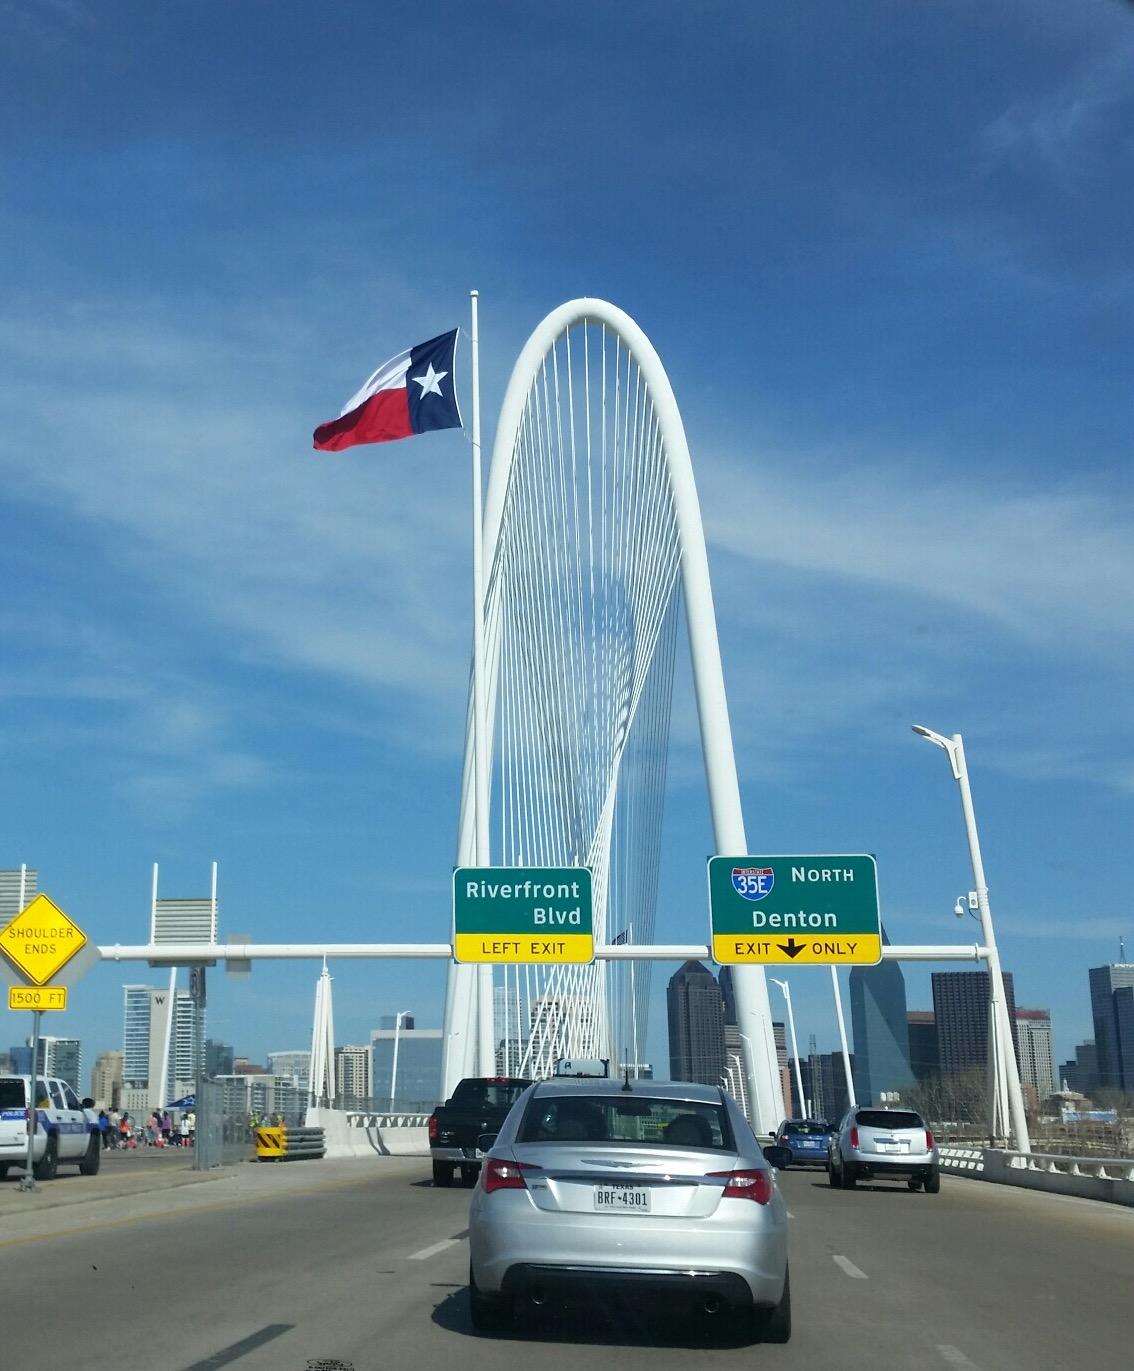 Built in 2012, The Margaret Hunt Hill Bridge is a fairly new Dallas landmark.